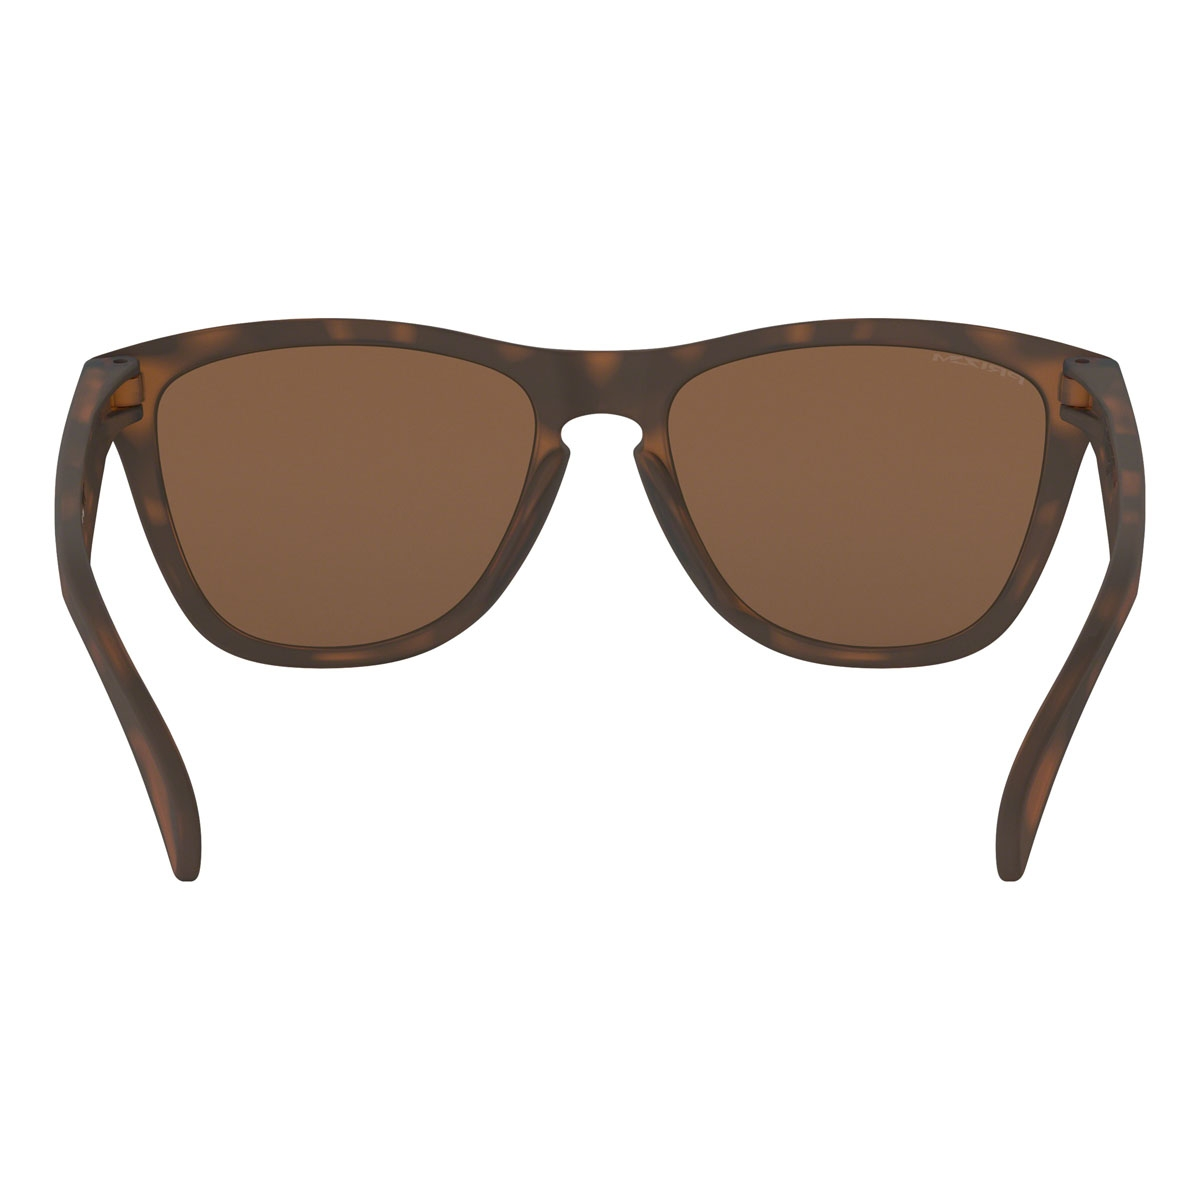 d016b9445721 ... Image of Oakley Frogskins Prizm Sunglasses - Matte Tortoise Frame PRIZM  Tungsten Lens ...